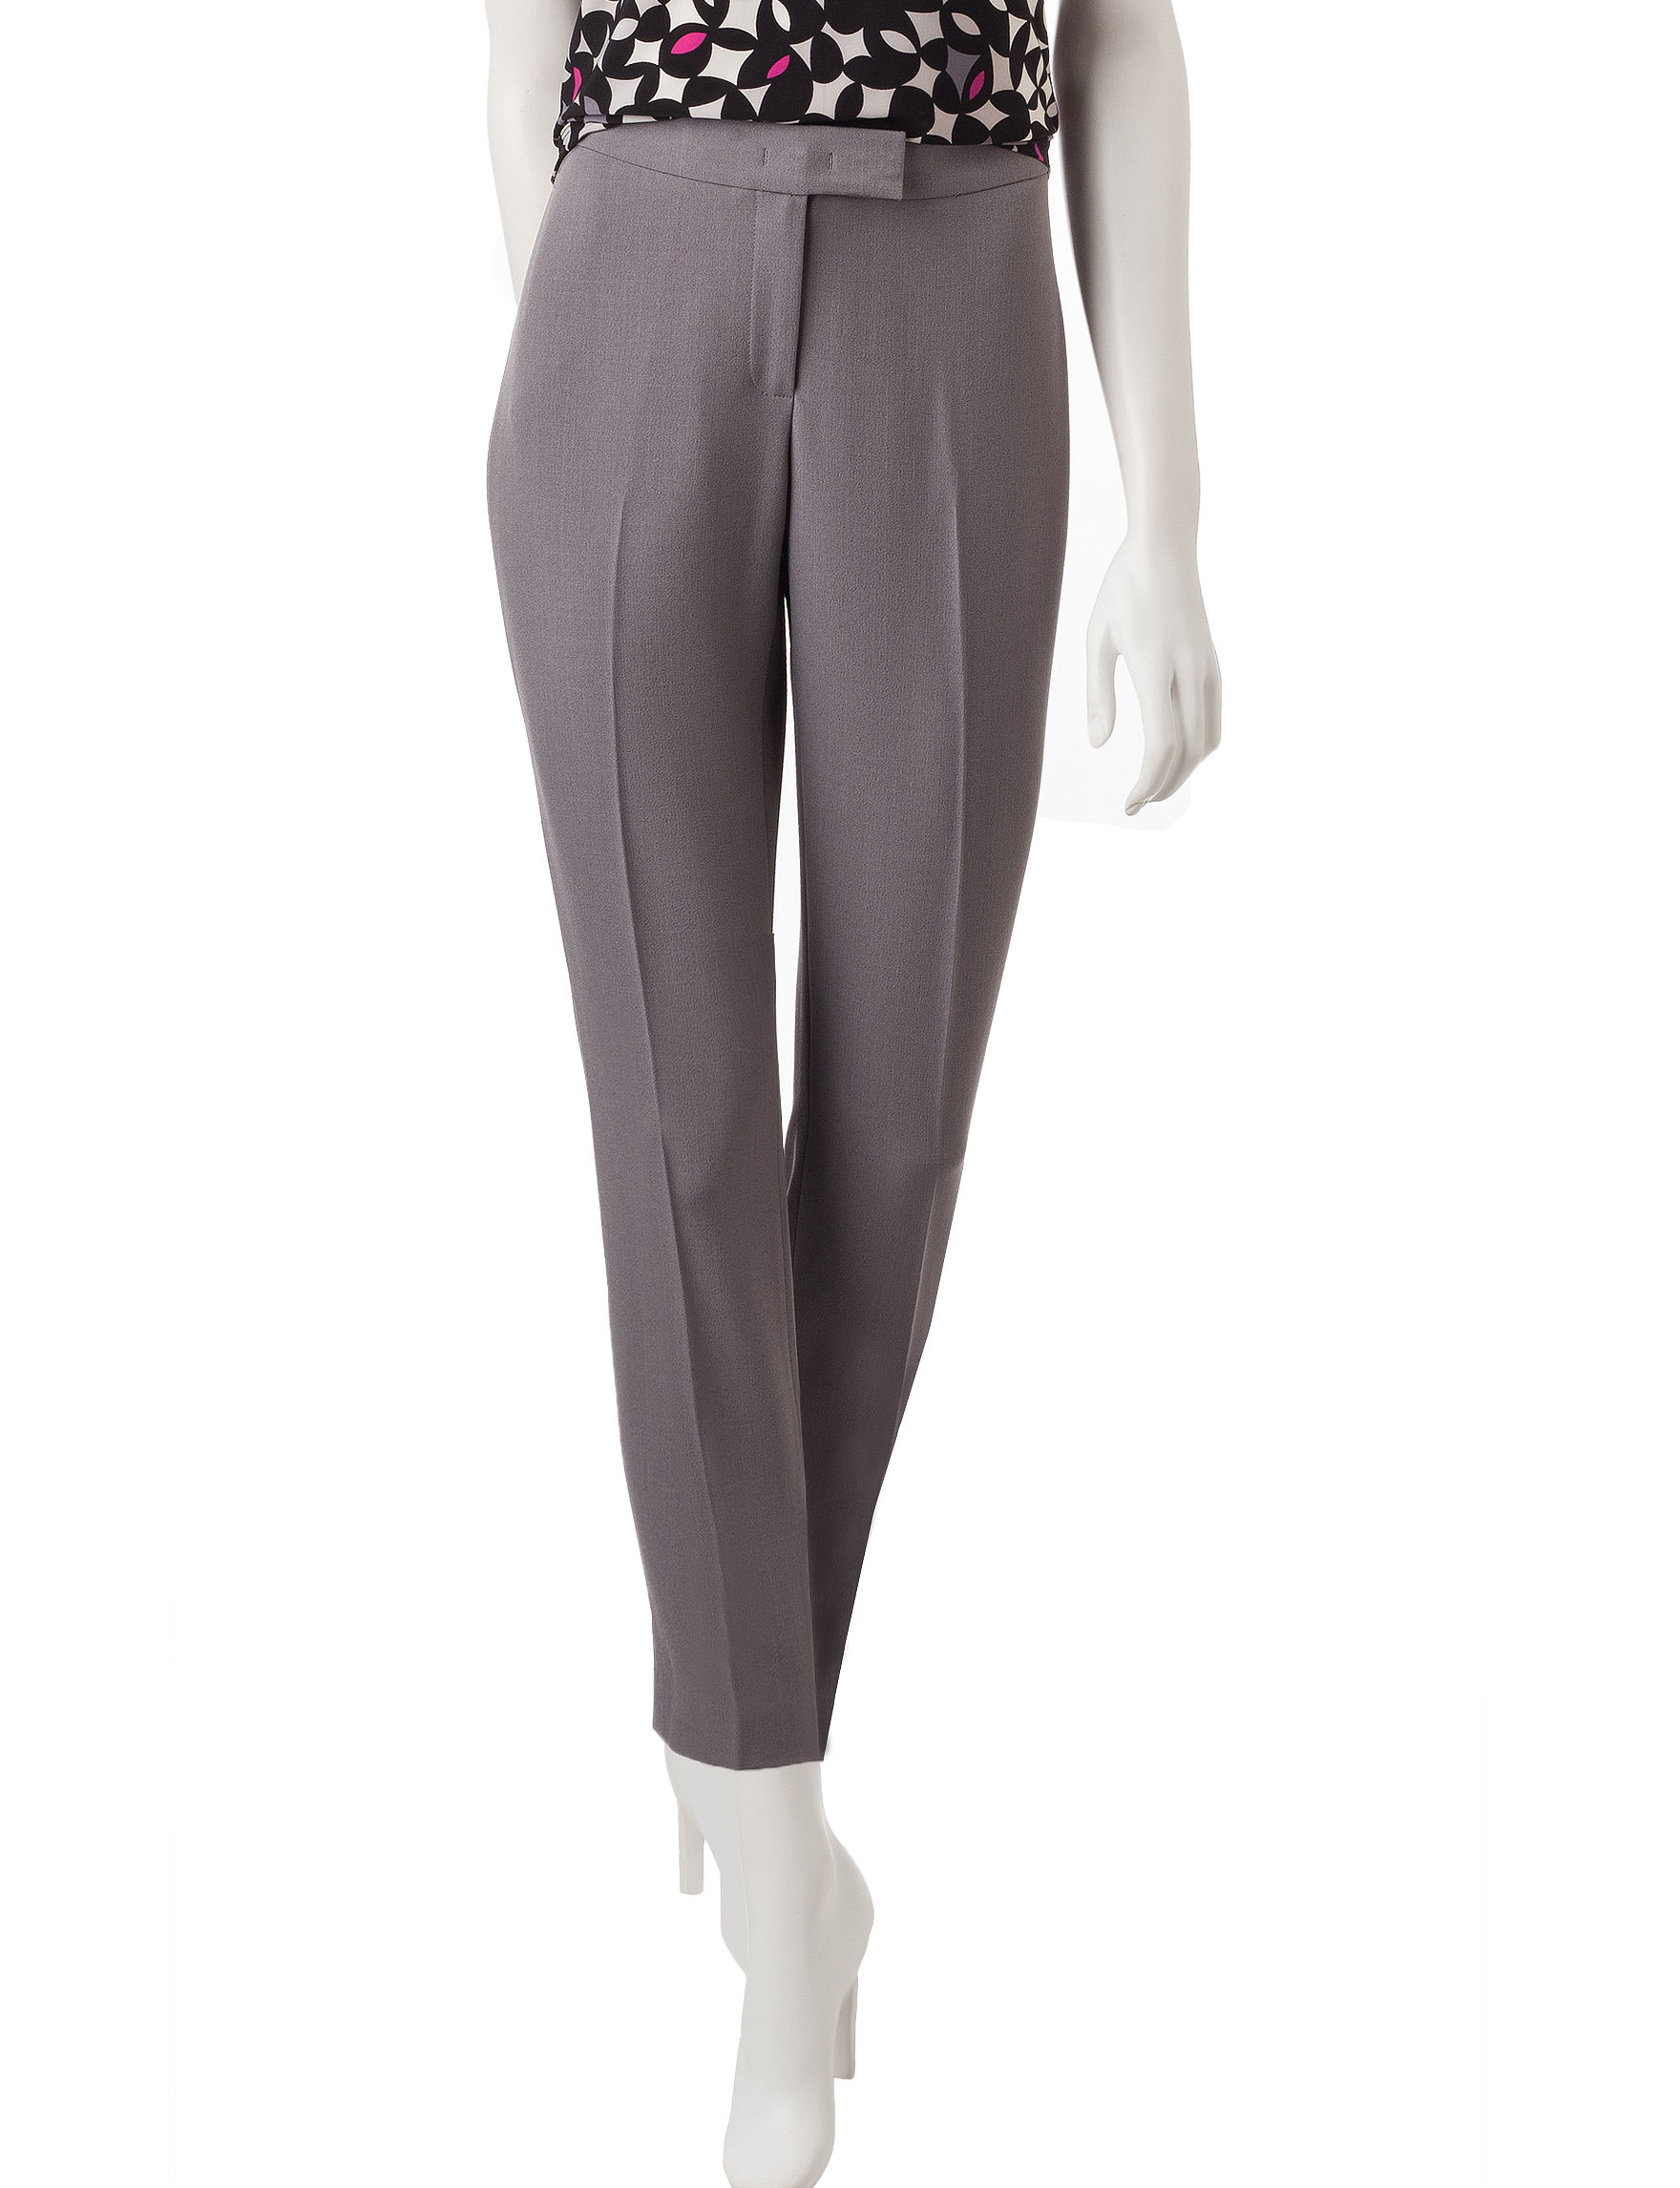 Anne Klein Grey Soft Pants